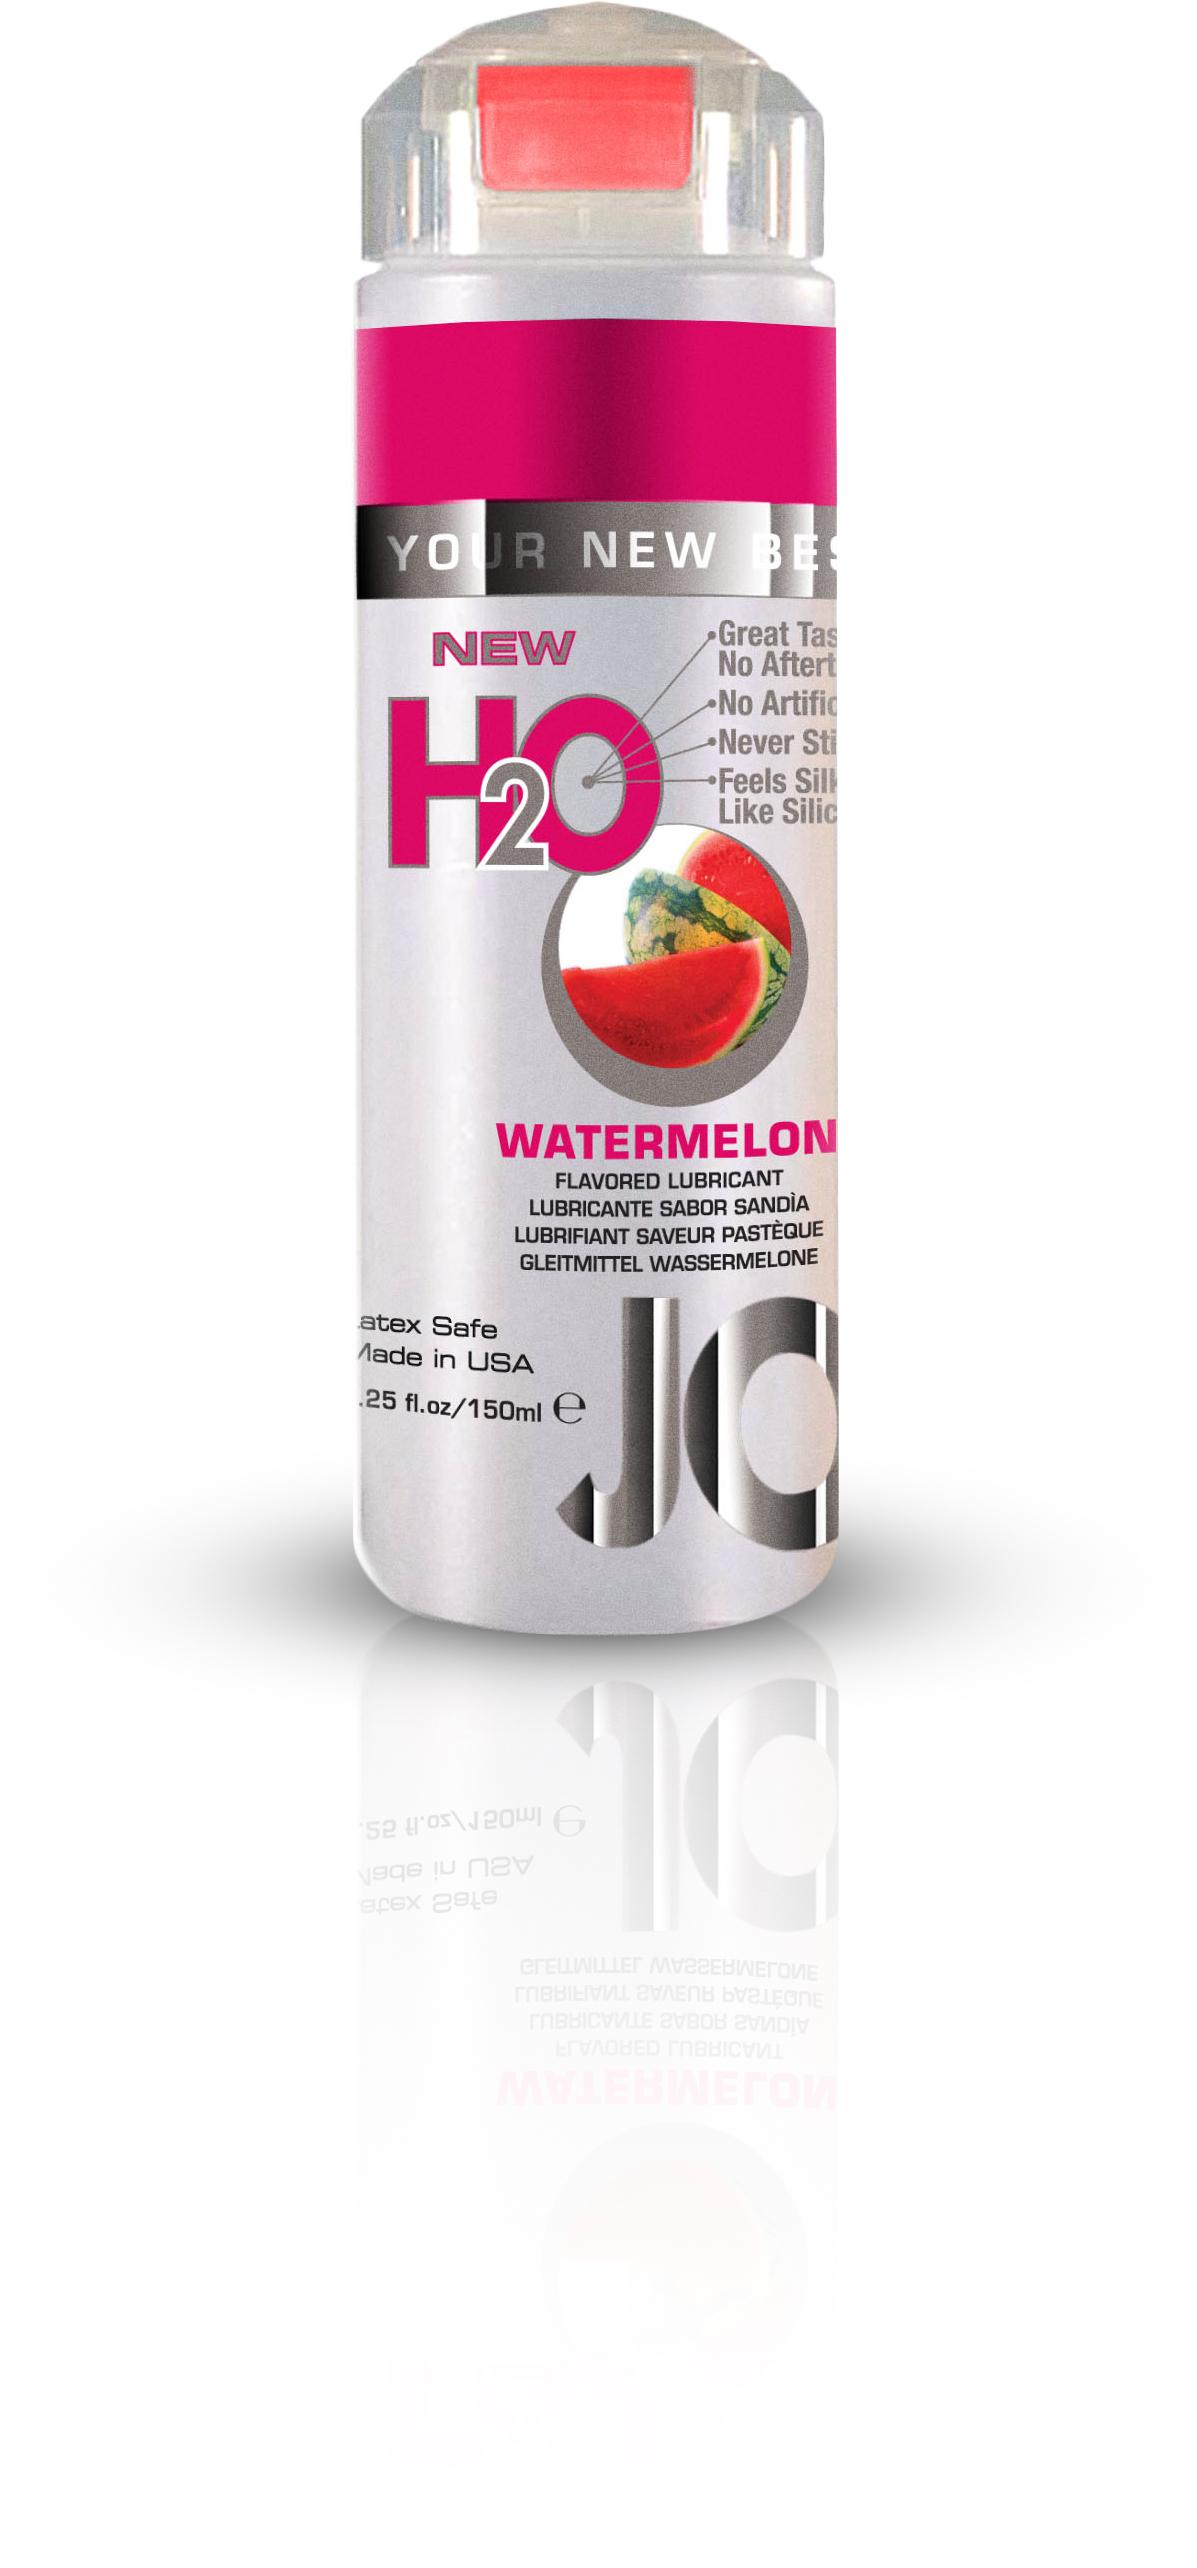 40119_JO_flavored_5.25oz_watermelon.jpg